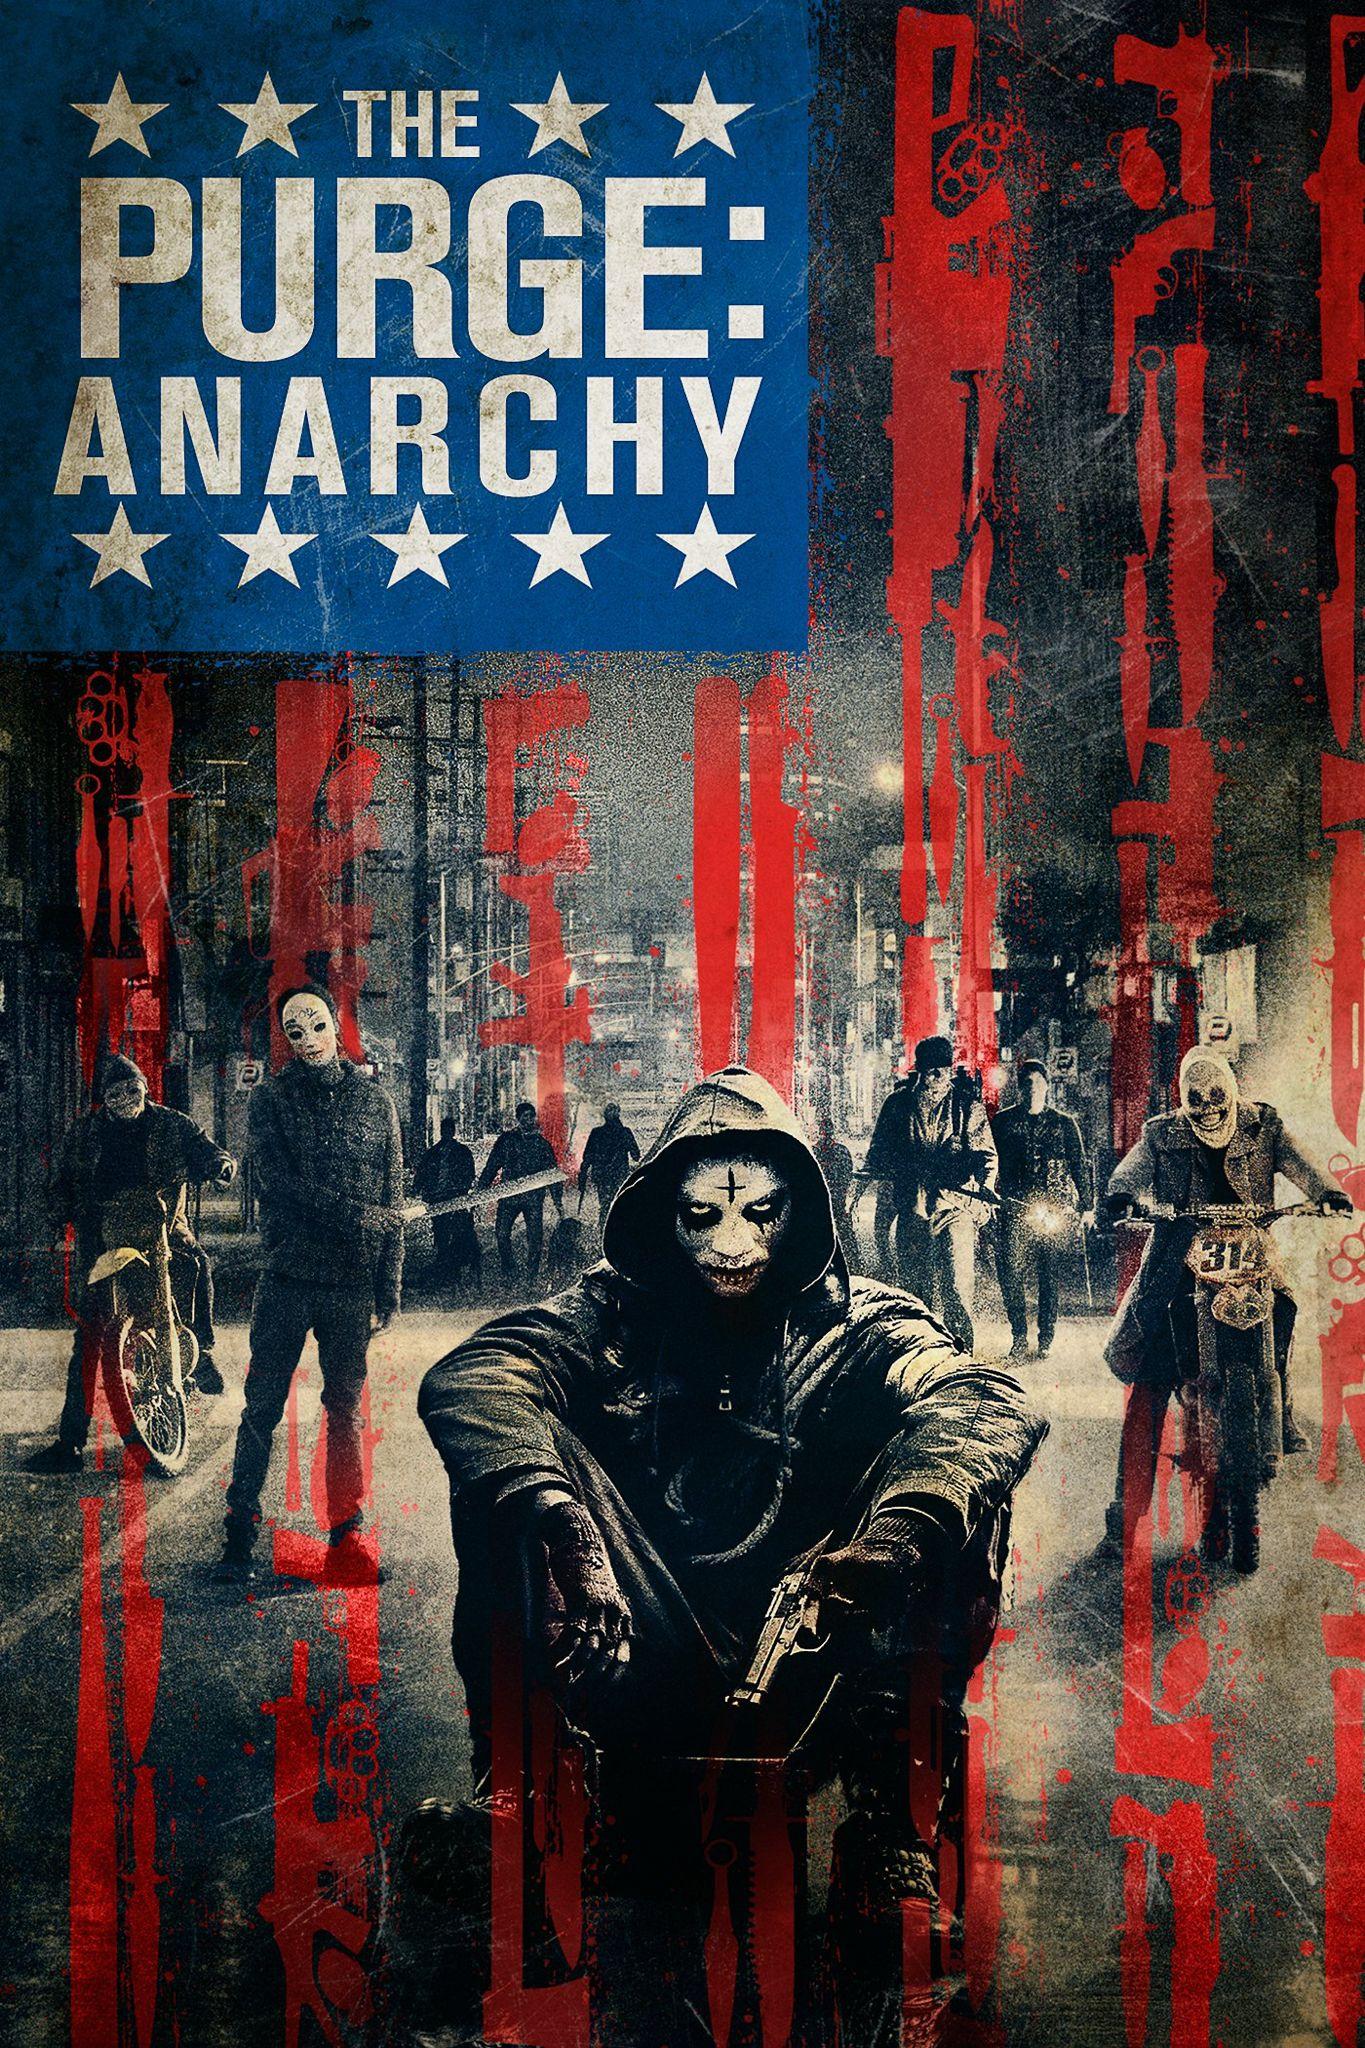 The Purge: Anarchy (2014) | Movies | Pinterest | Fondos